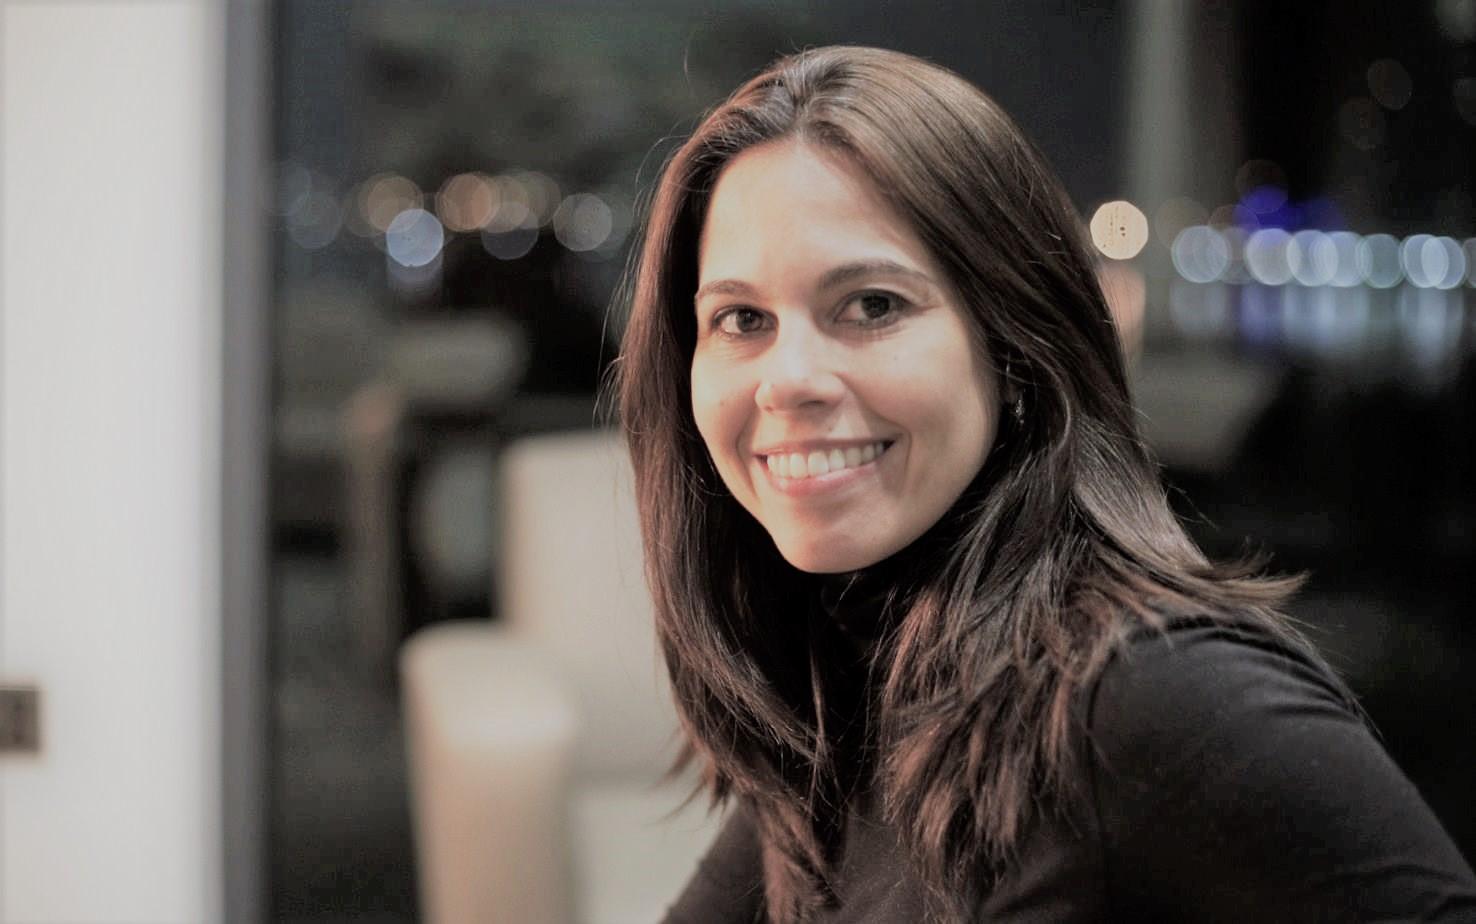 Anita Fiori